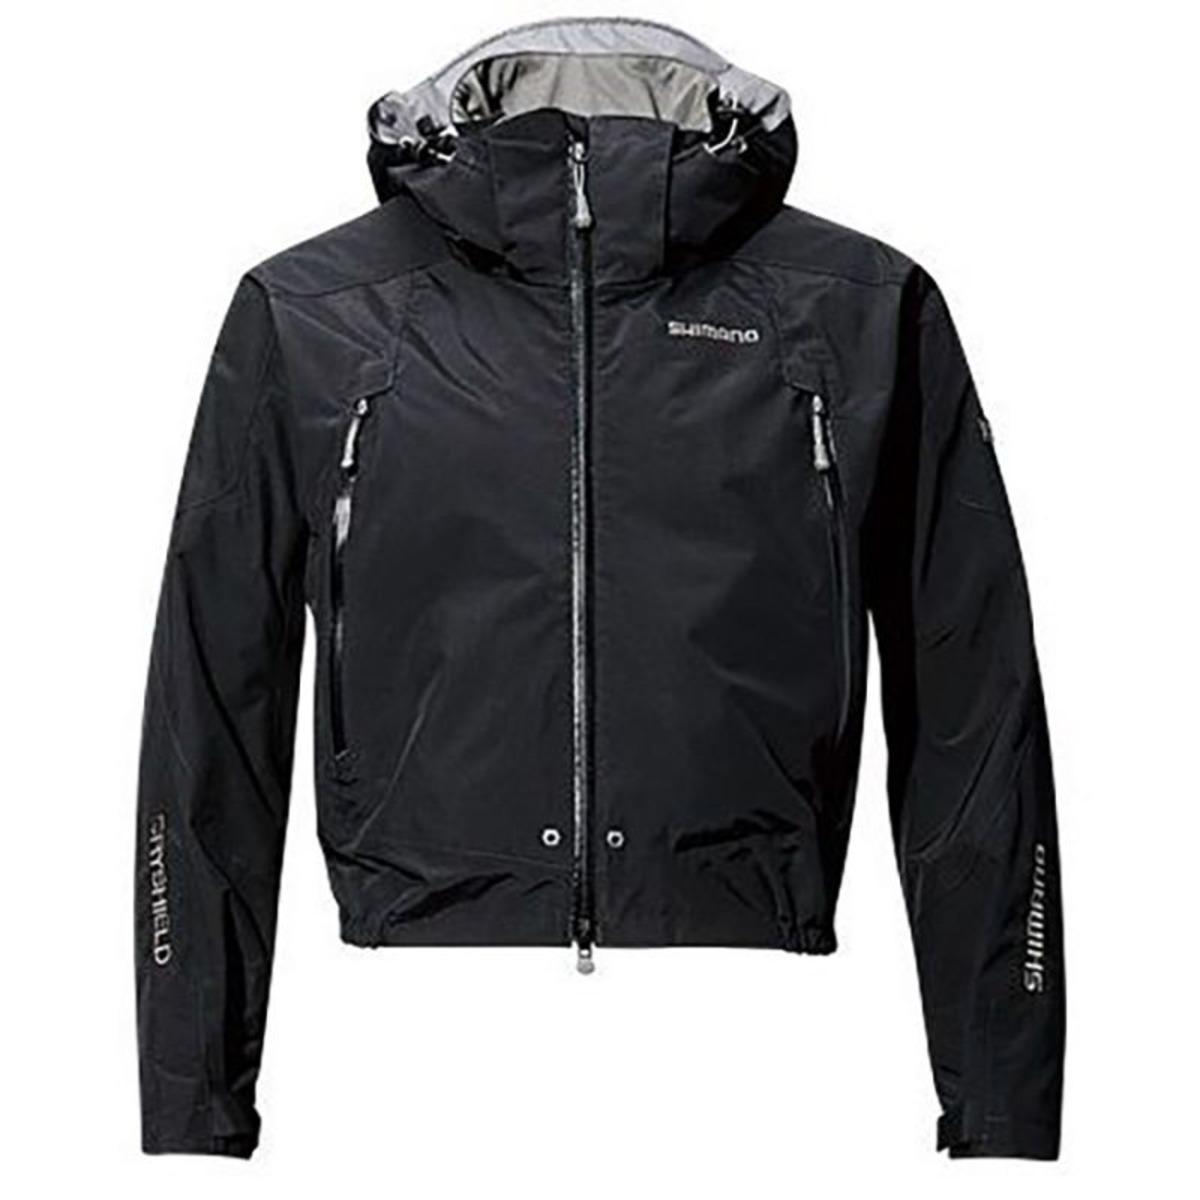 Shimano Jacke Dryshield Advance Short Rain - L - Black